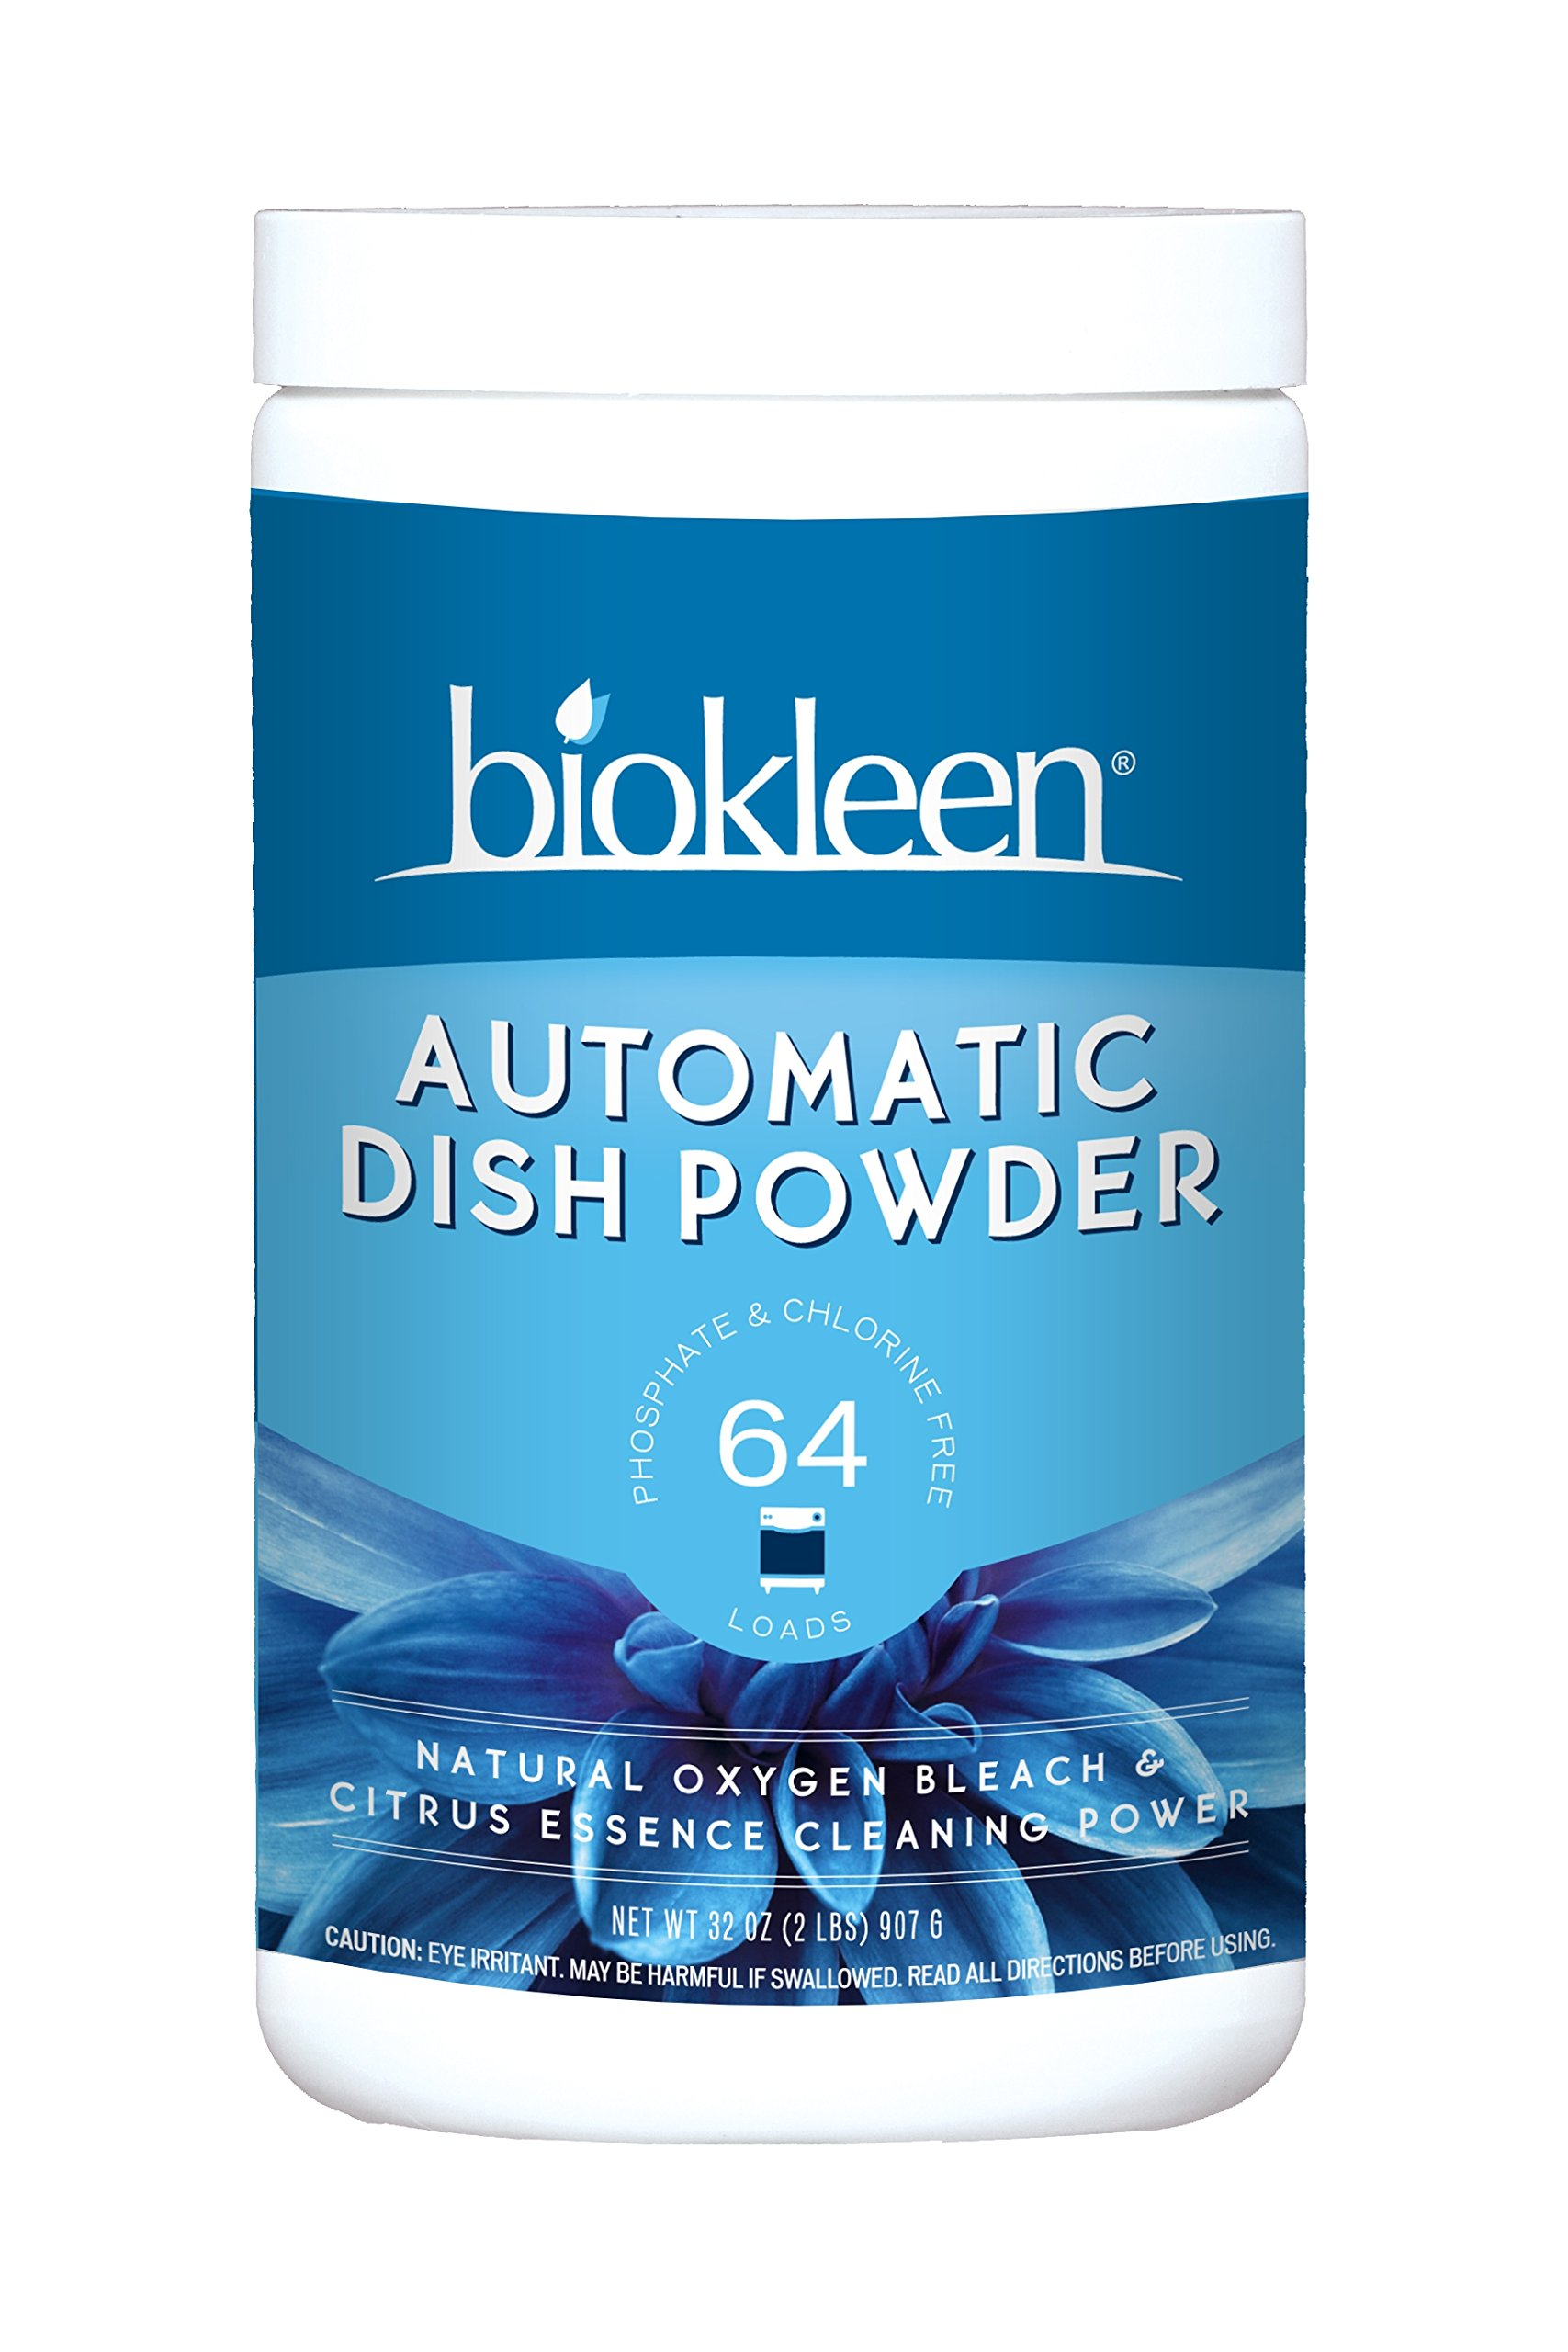 Biokleen Automatic Dish Powder, Dishwasher Detergent, Natural Oxygen Bleach & Citrus Essence Cleaning Powder, 2 Pounds (Pack of 12)